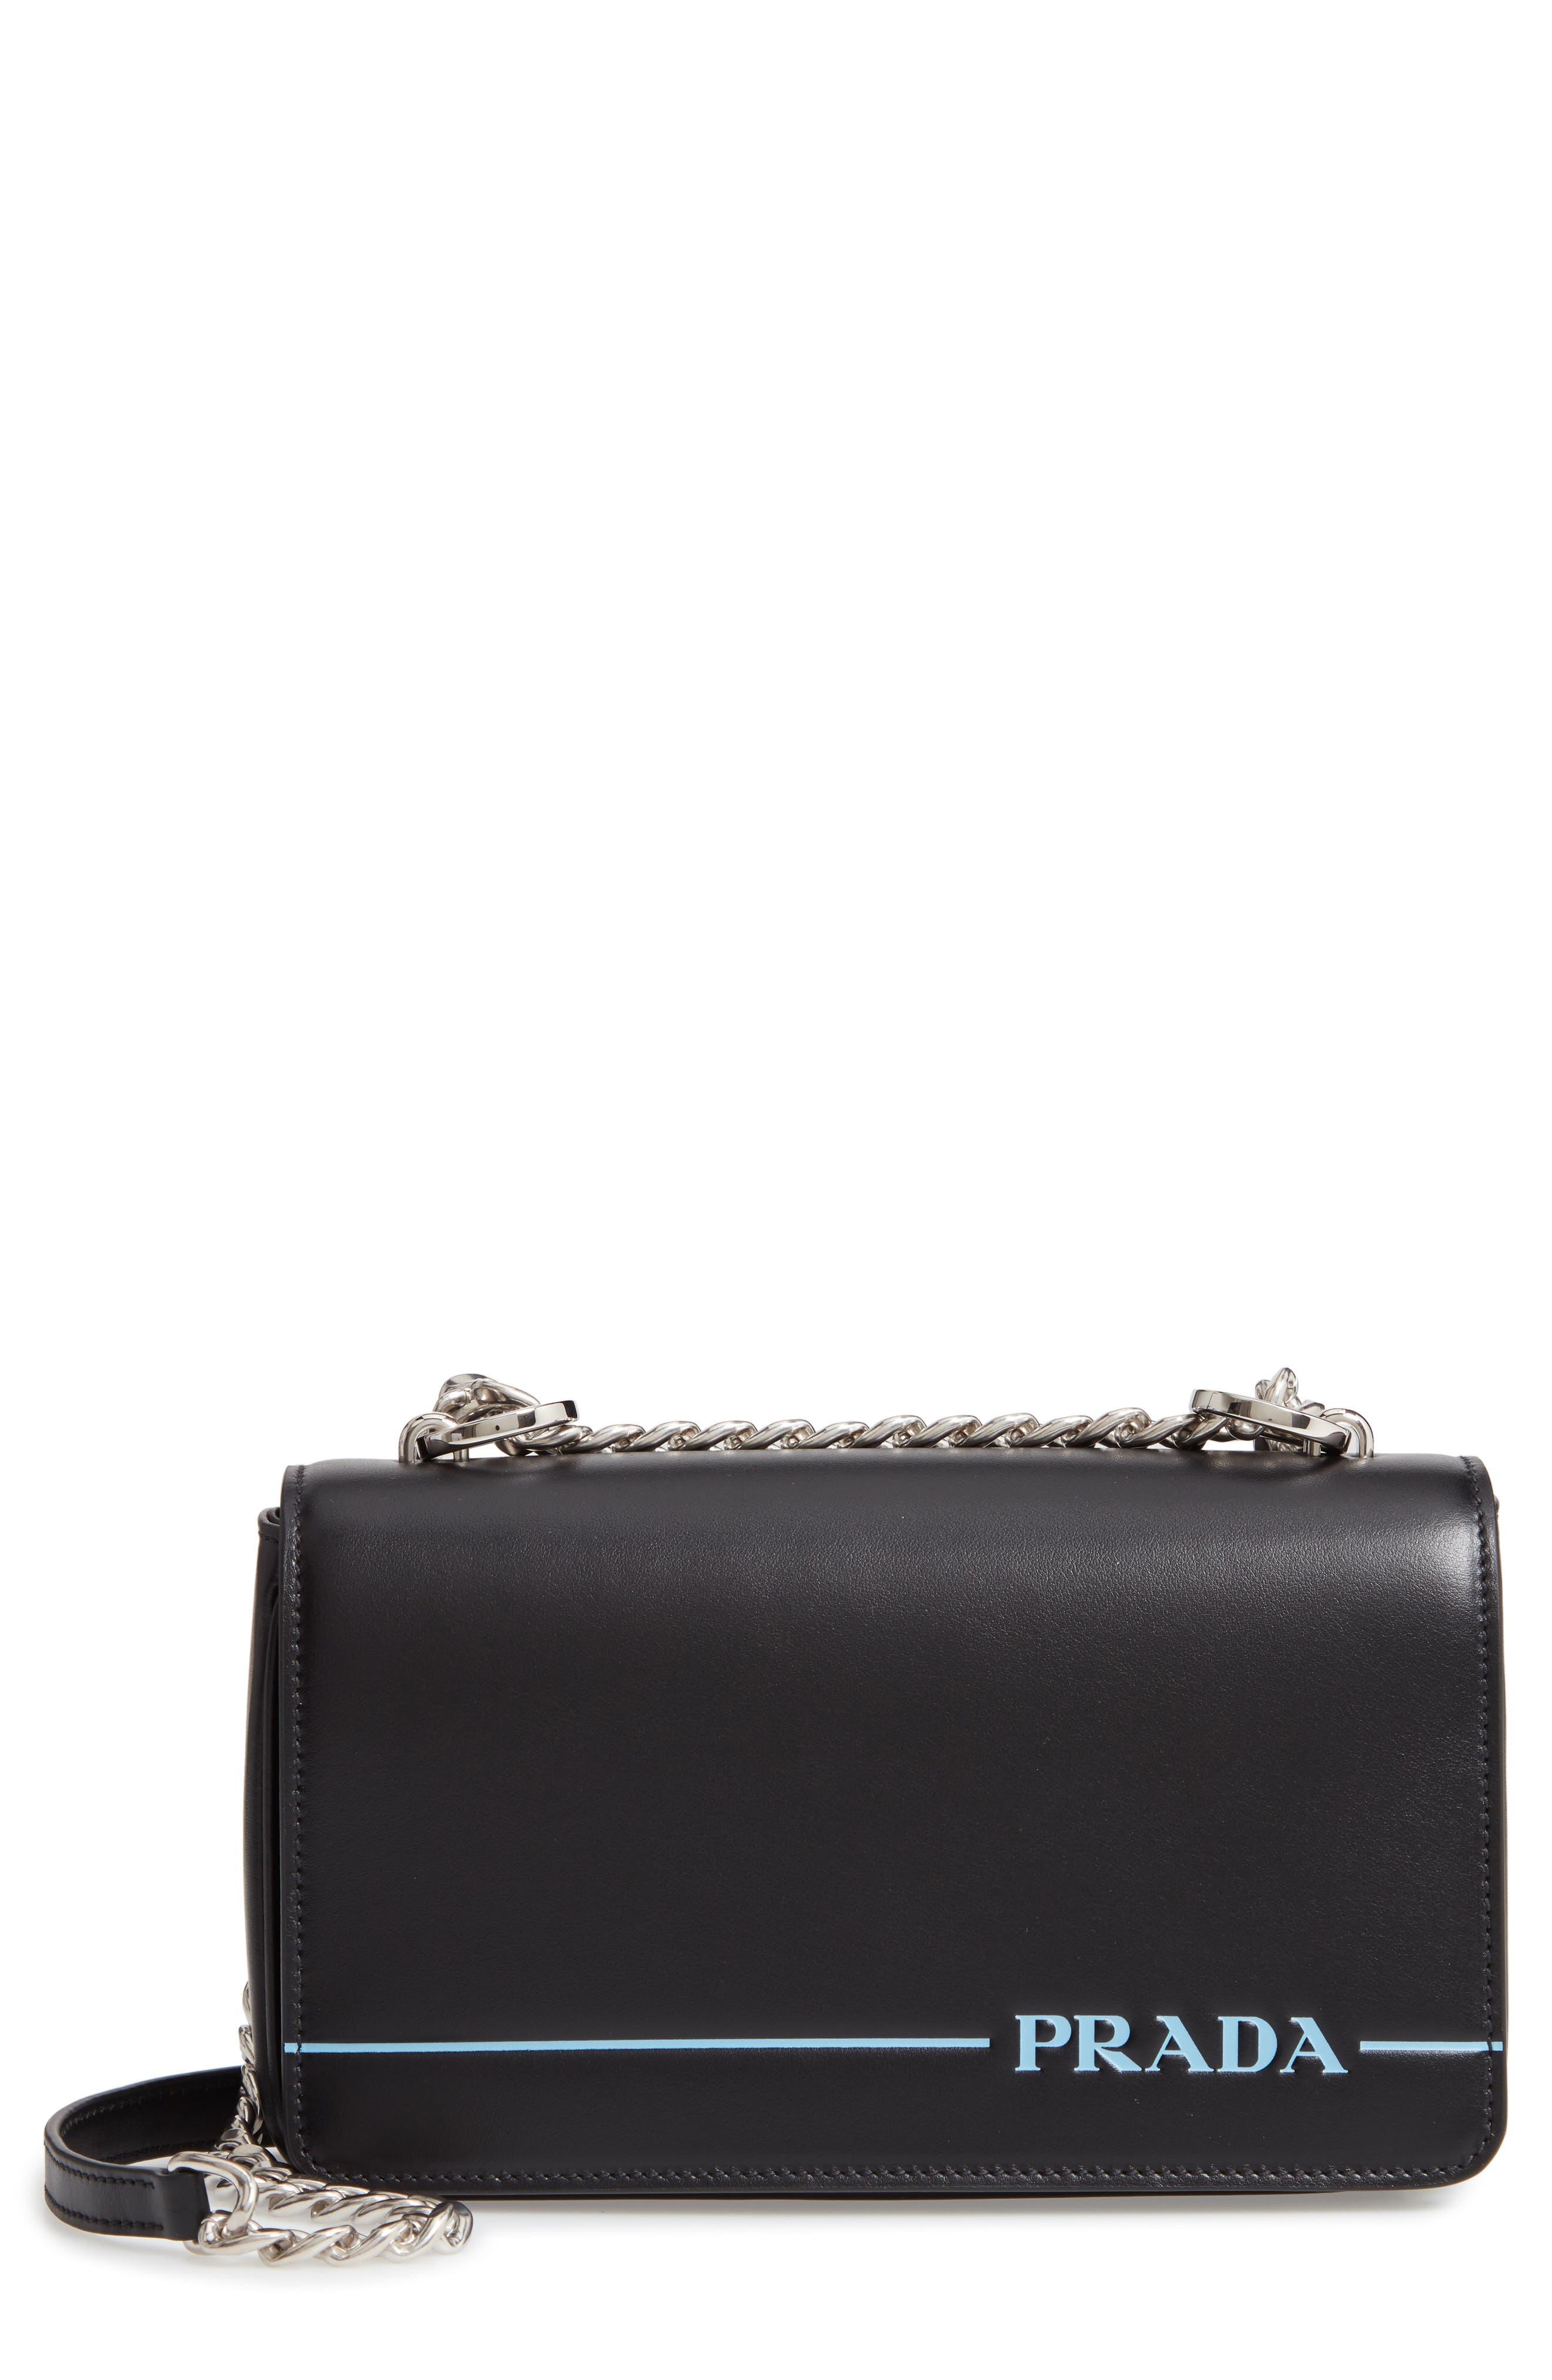 46df54910791 Prada Crossbody Bags   Nordstrom